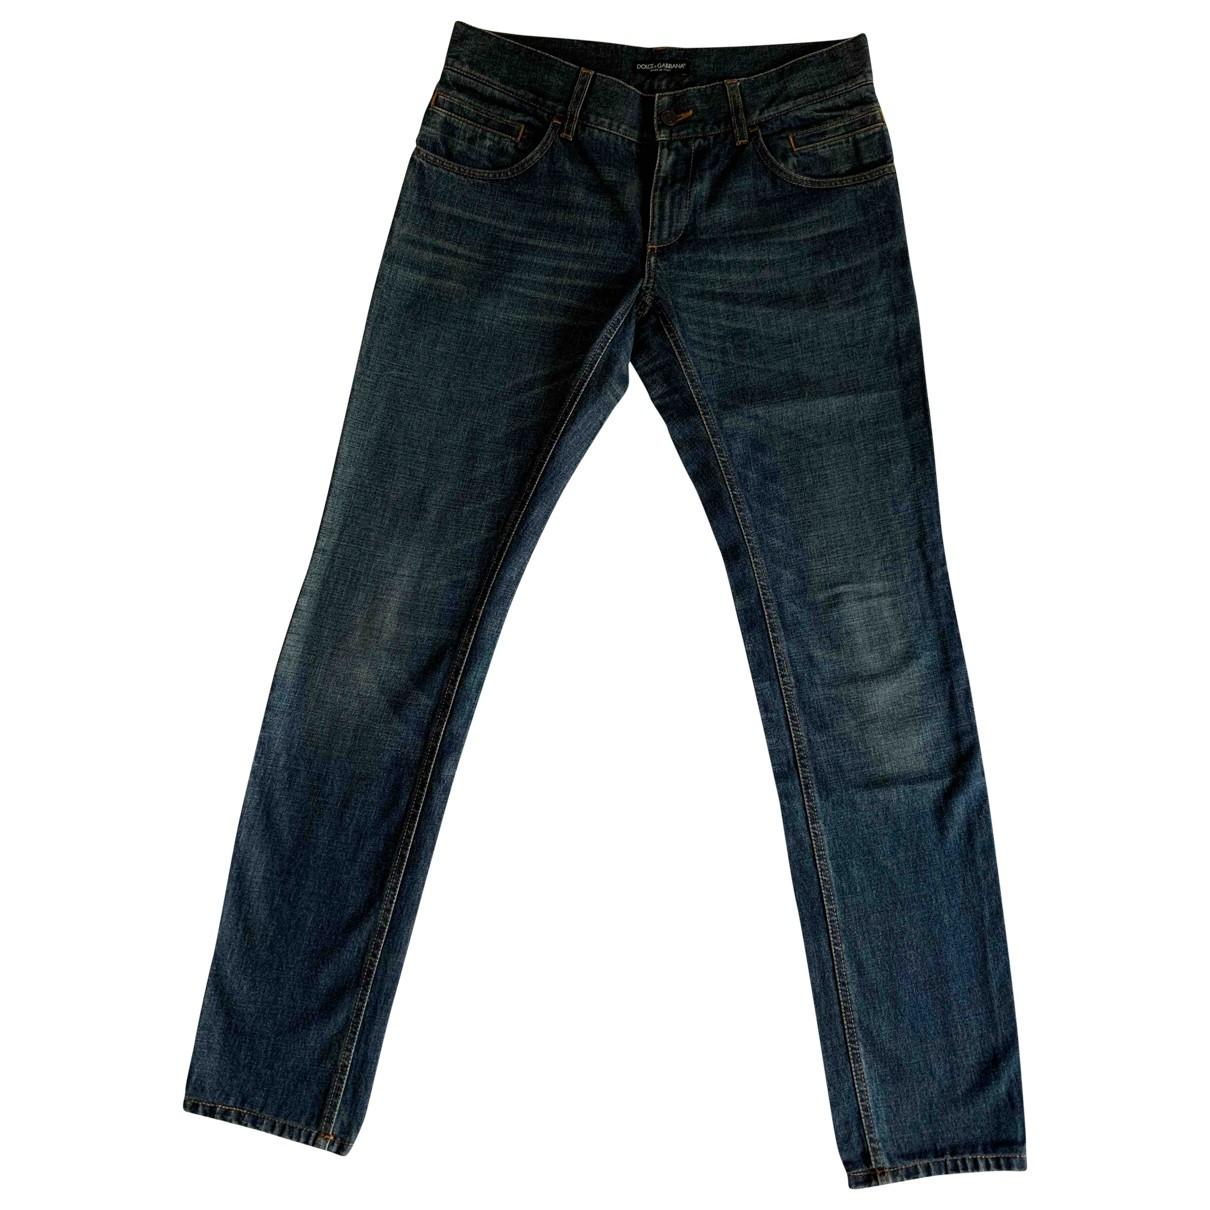 Dolce & Gabbana \N Navy Cotton Jeans for Men 32 US